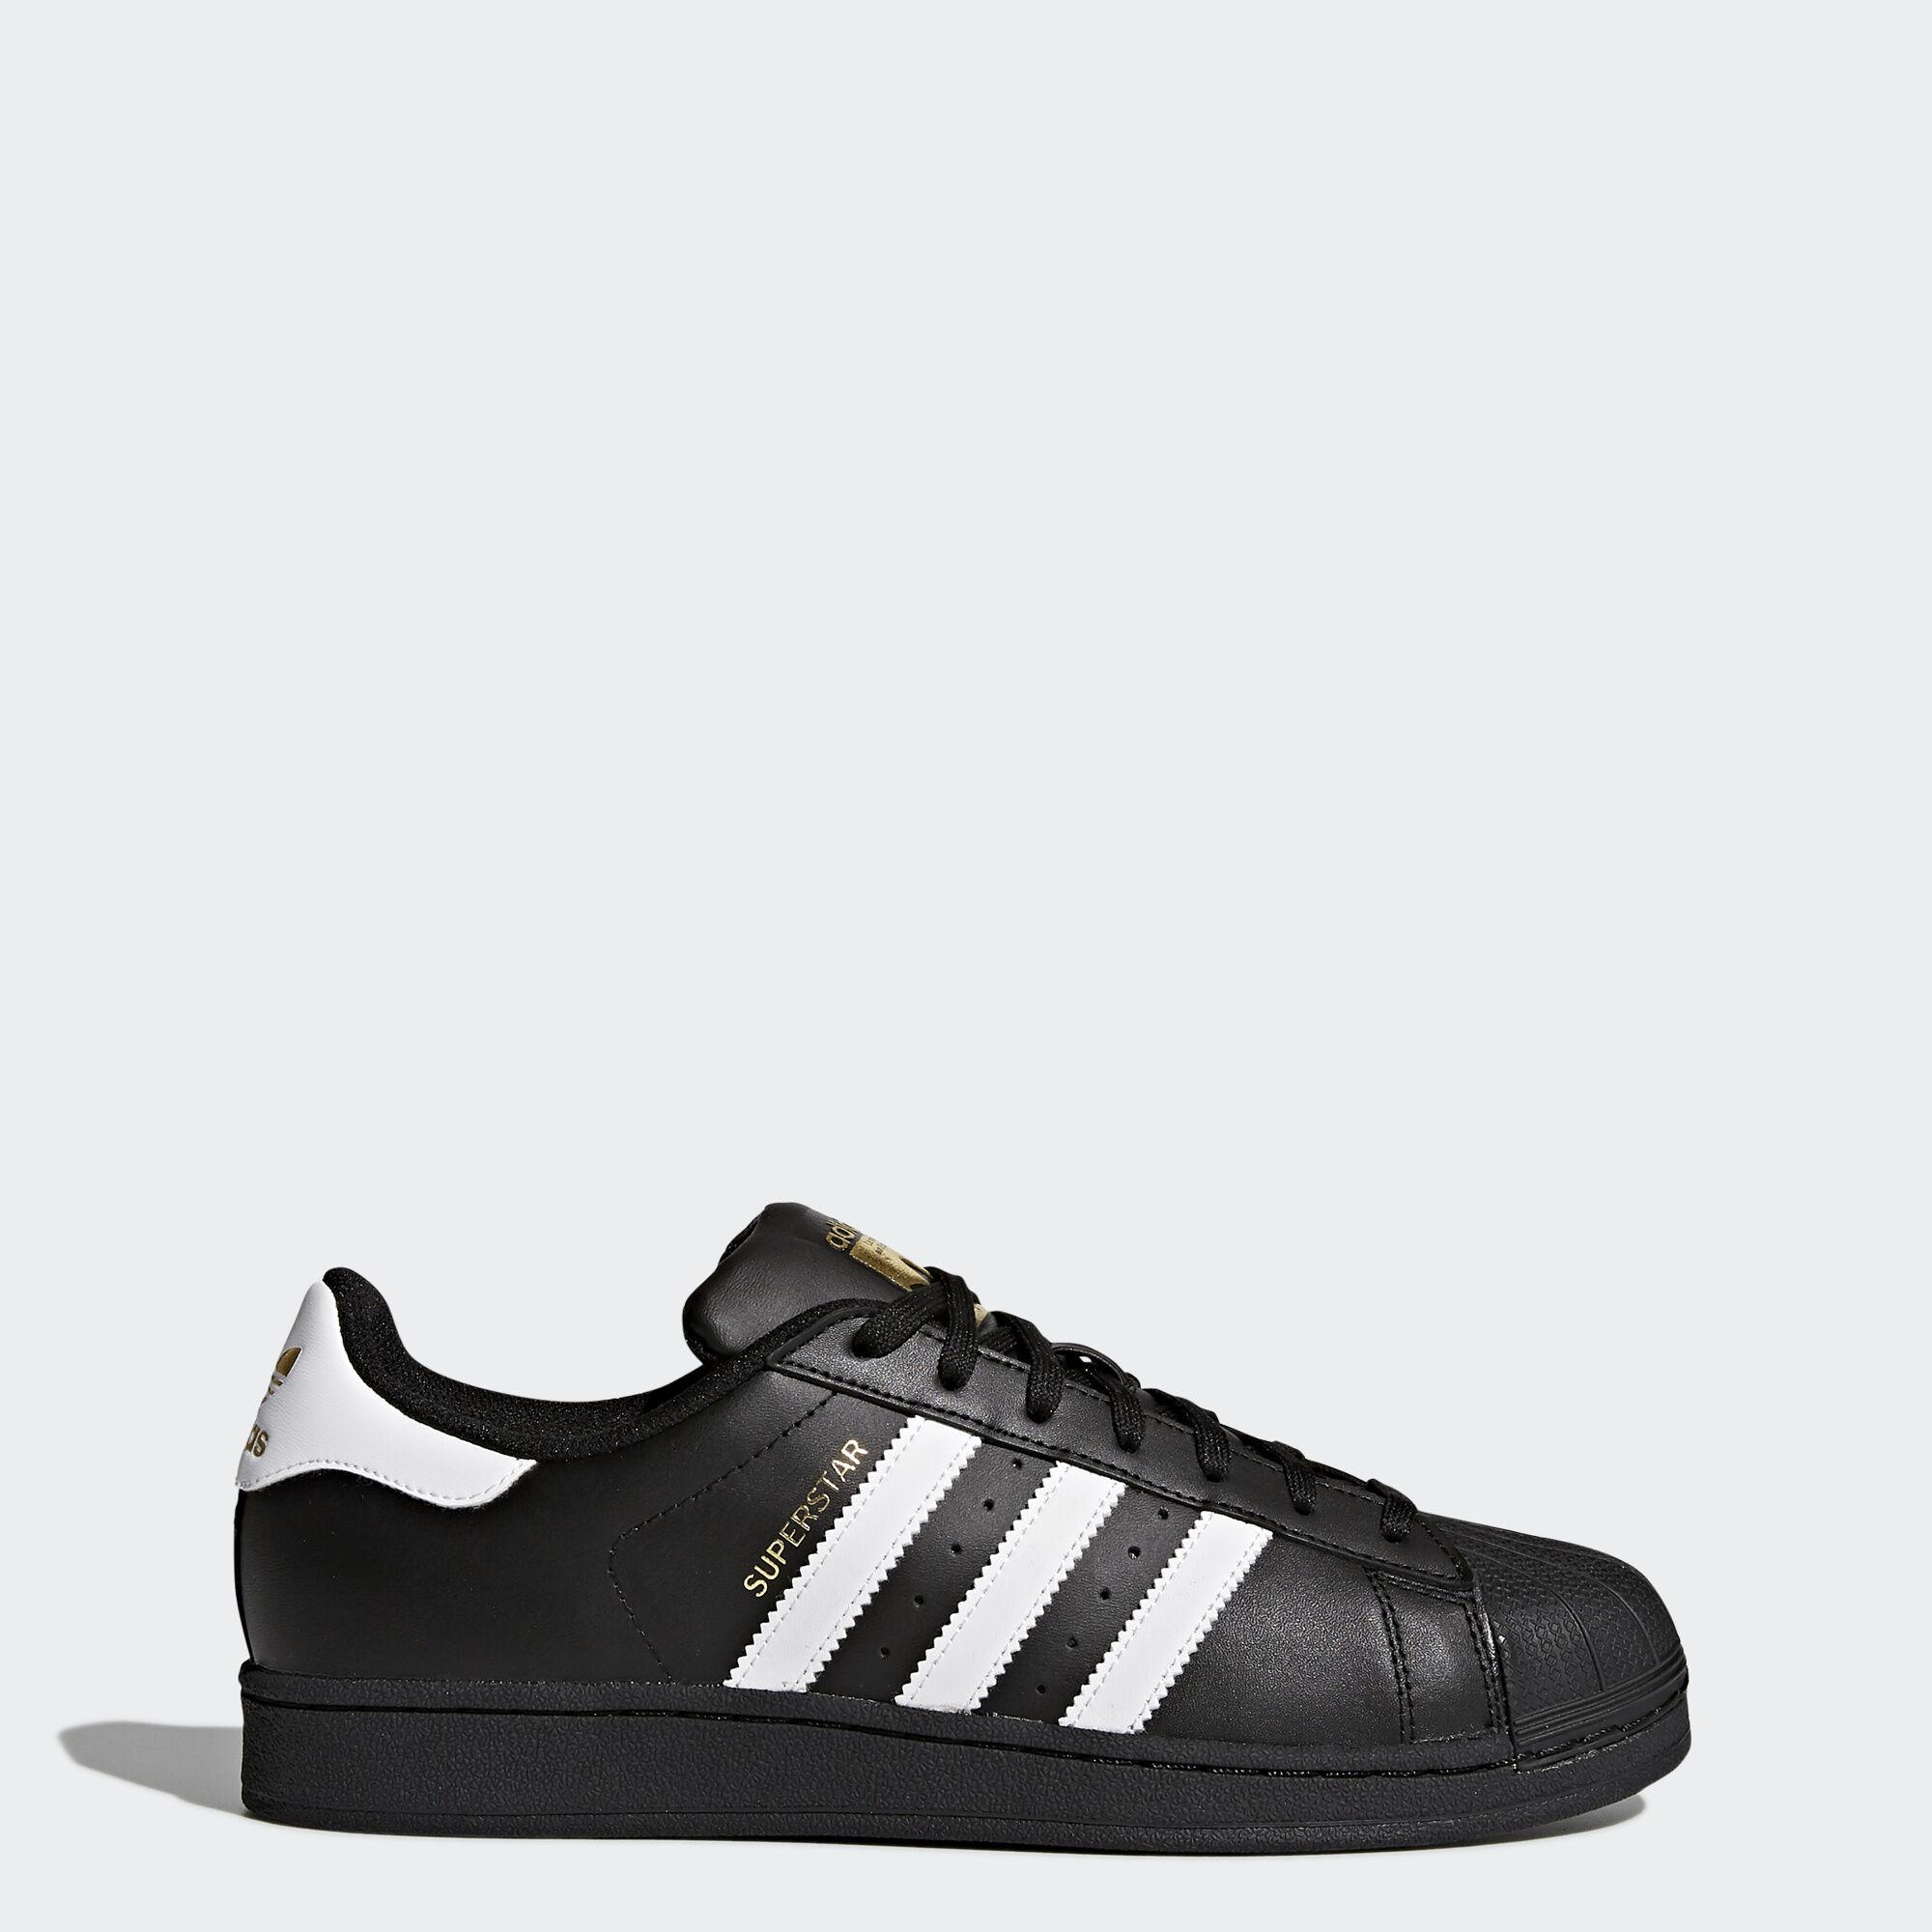 adidas - Superstar Foundation Shoes Core Black / Cloud White / Core Black  B27140 ...